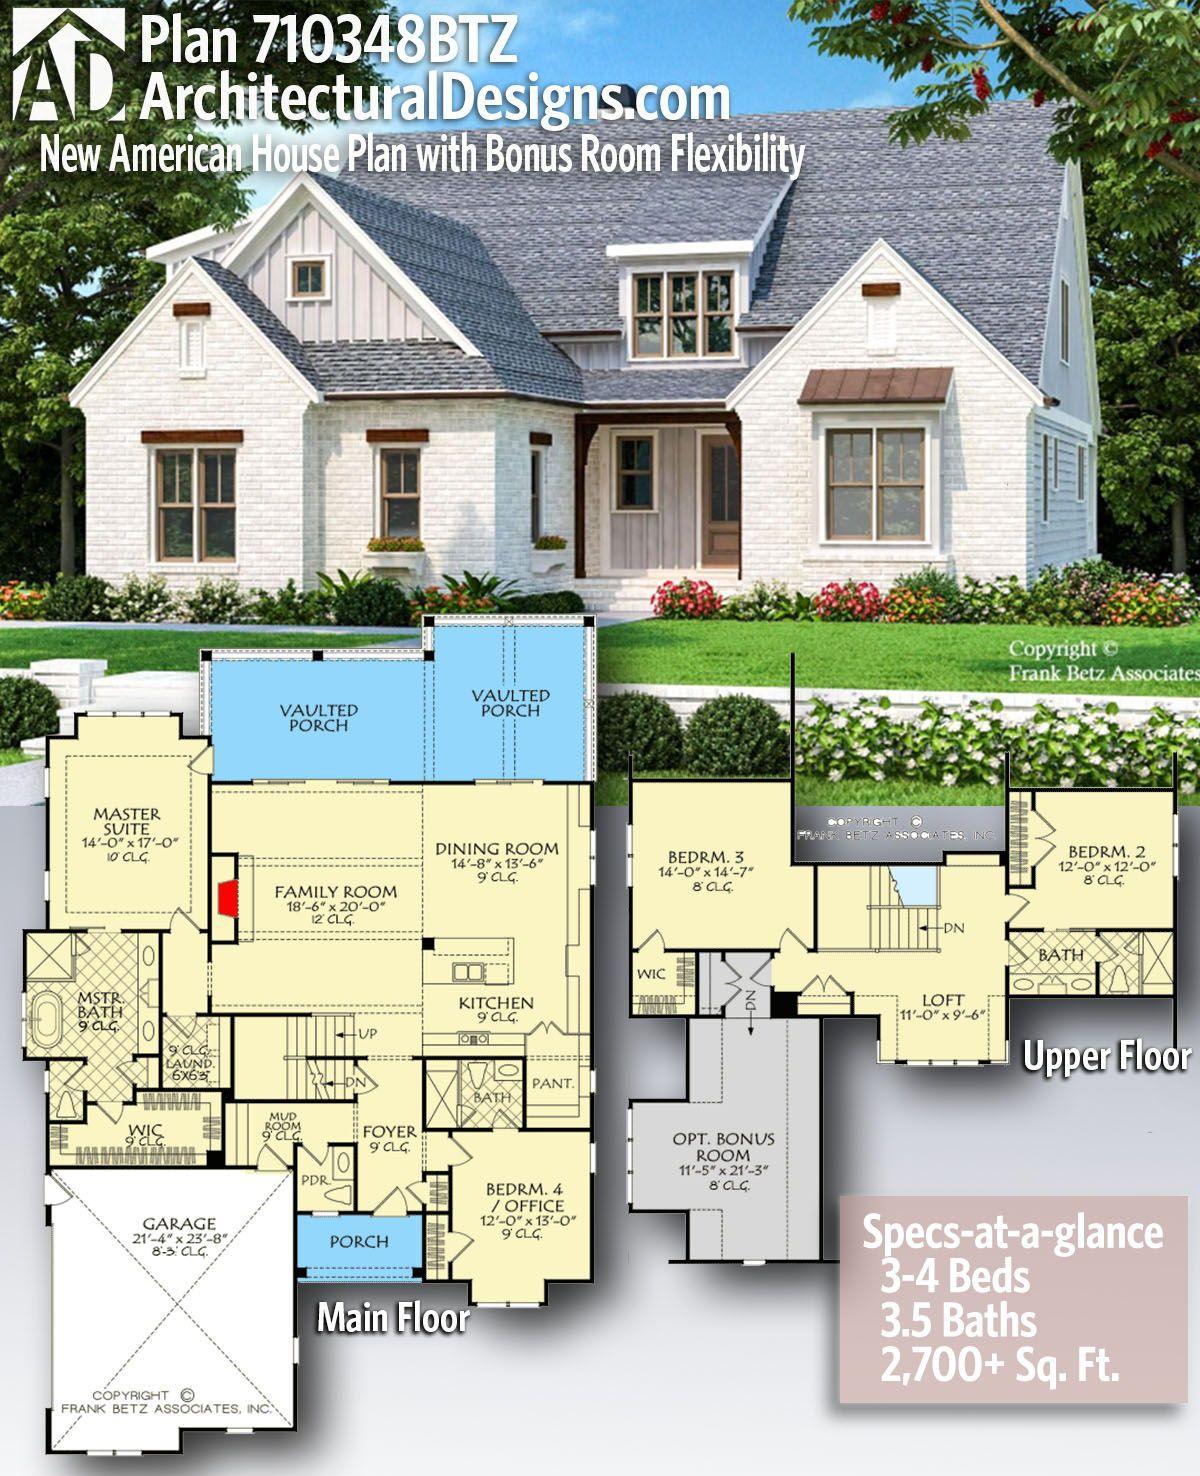 Plan 710348btz New American House Plan With Bonus Room